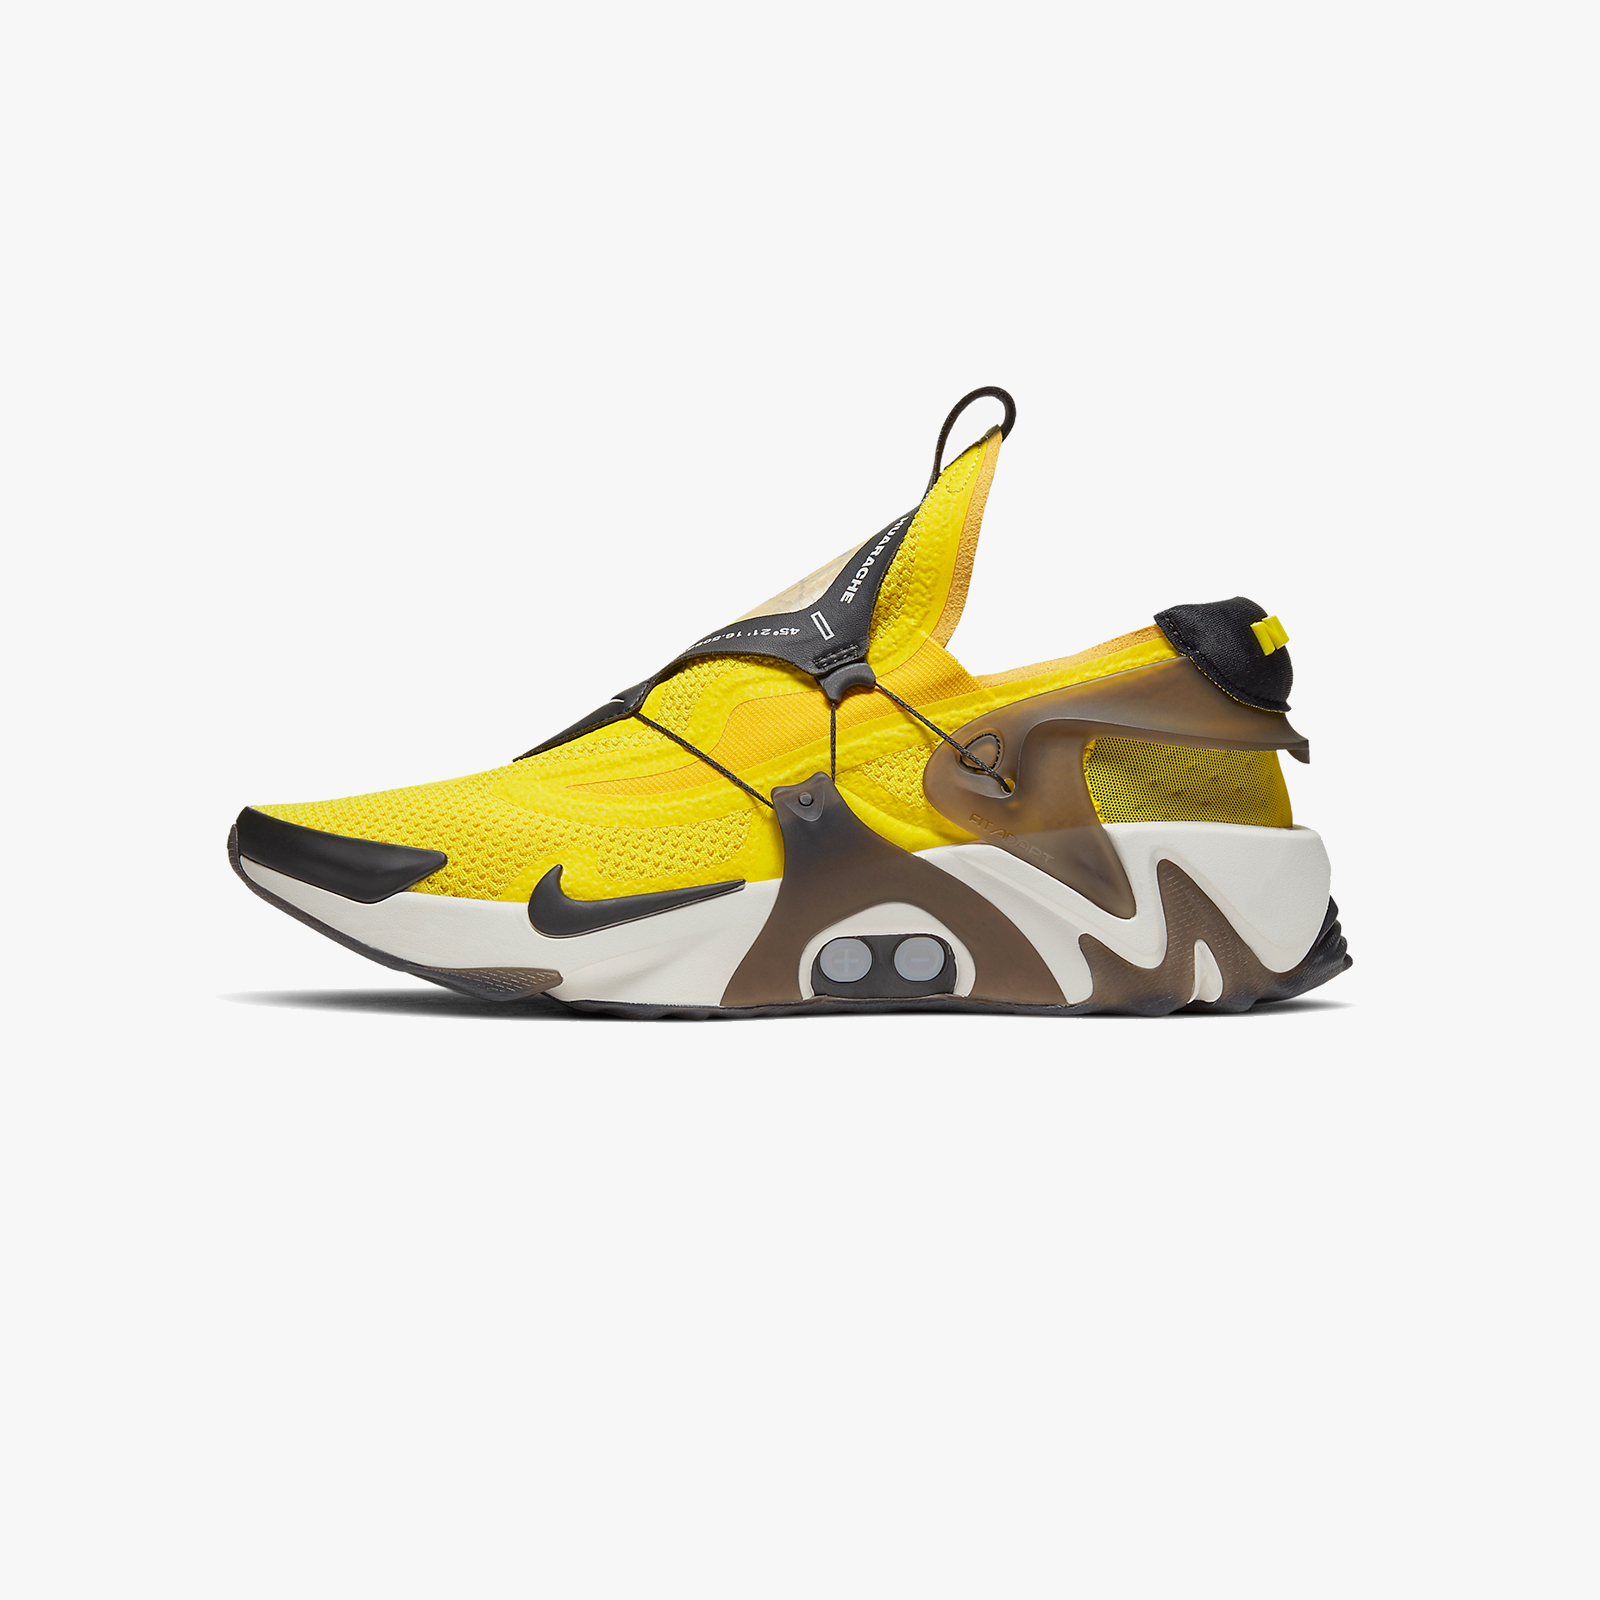 NIKE Air Huarache Run Special Edition Herren Sneaker Schwarz, Größenauswahl:45